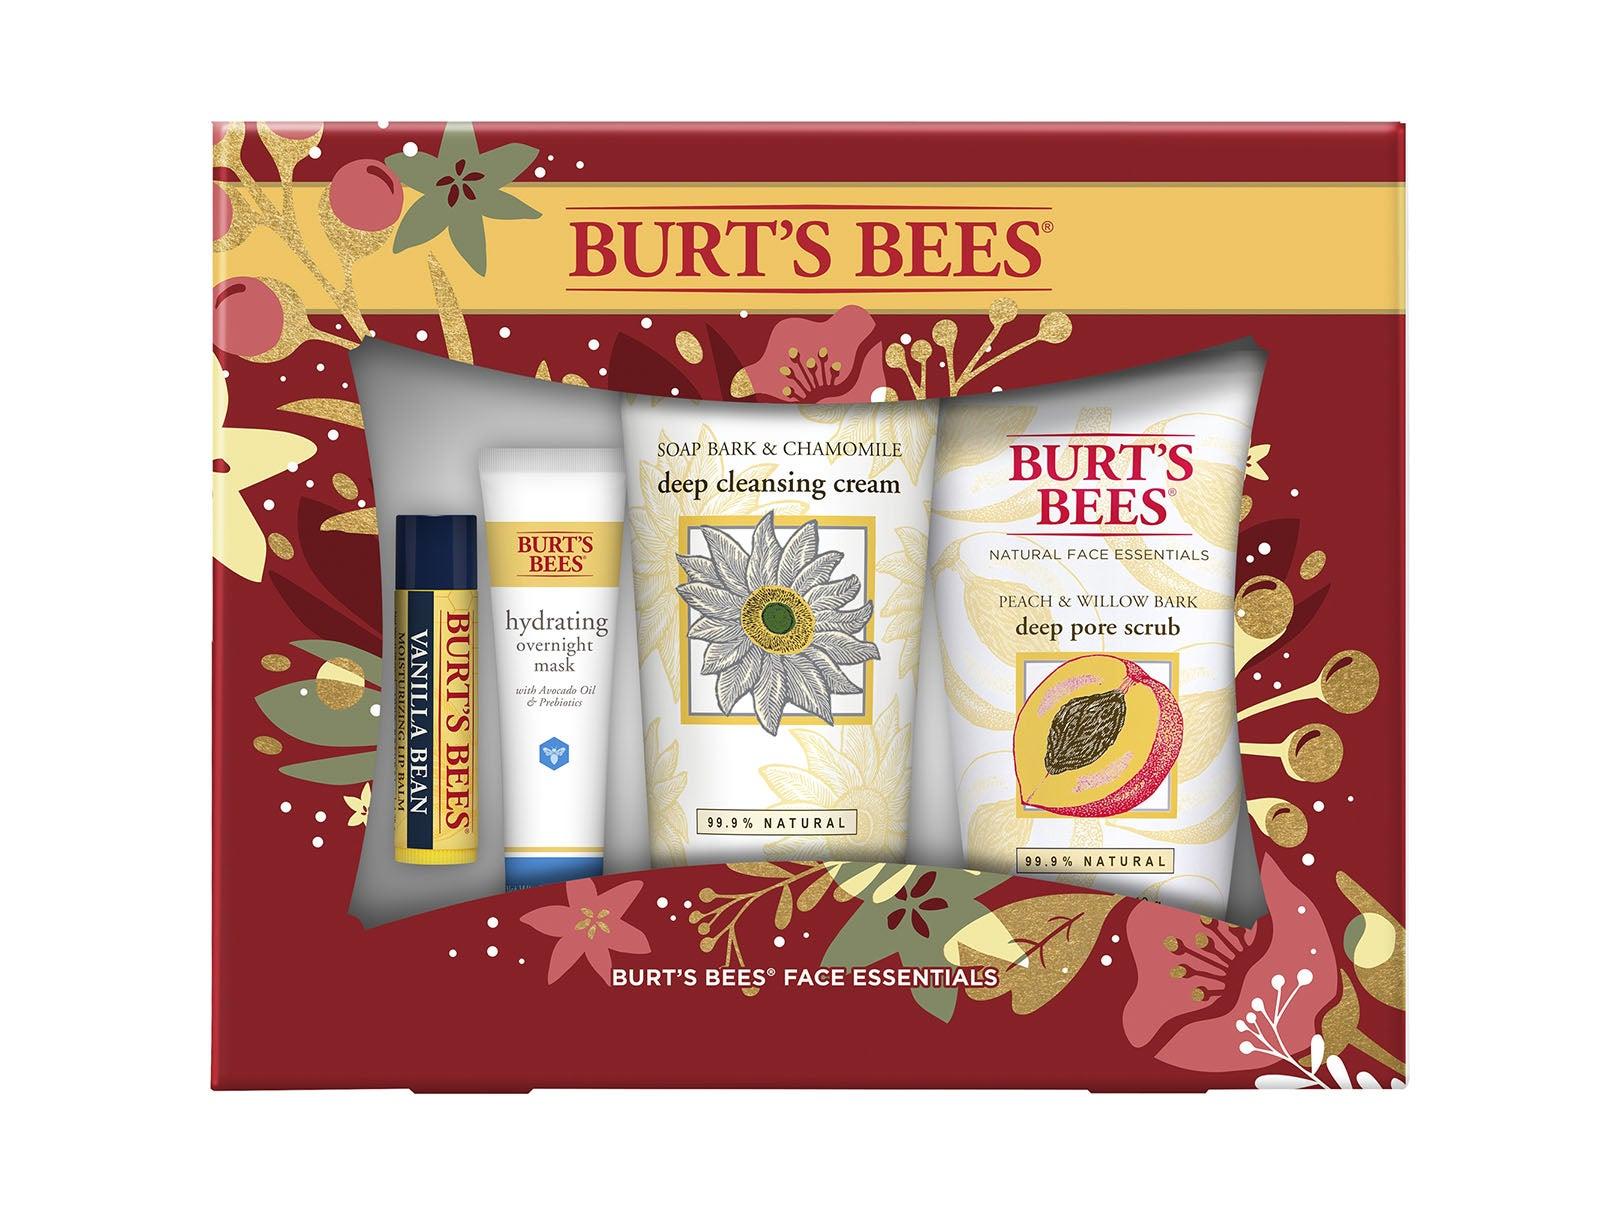 Burt's Bees Face Essentials Gift